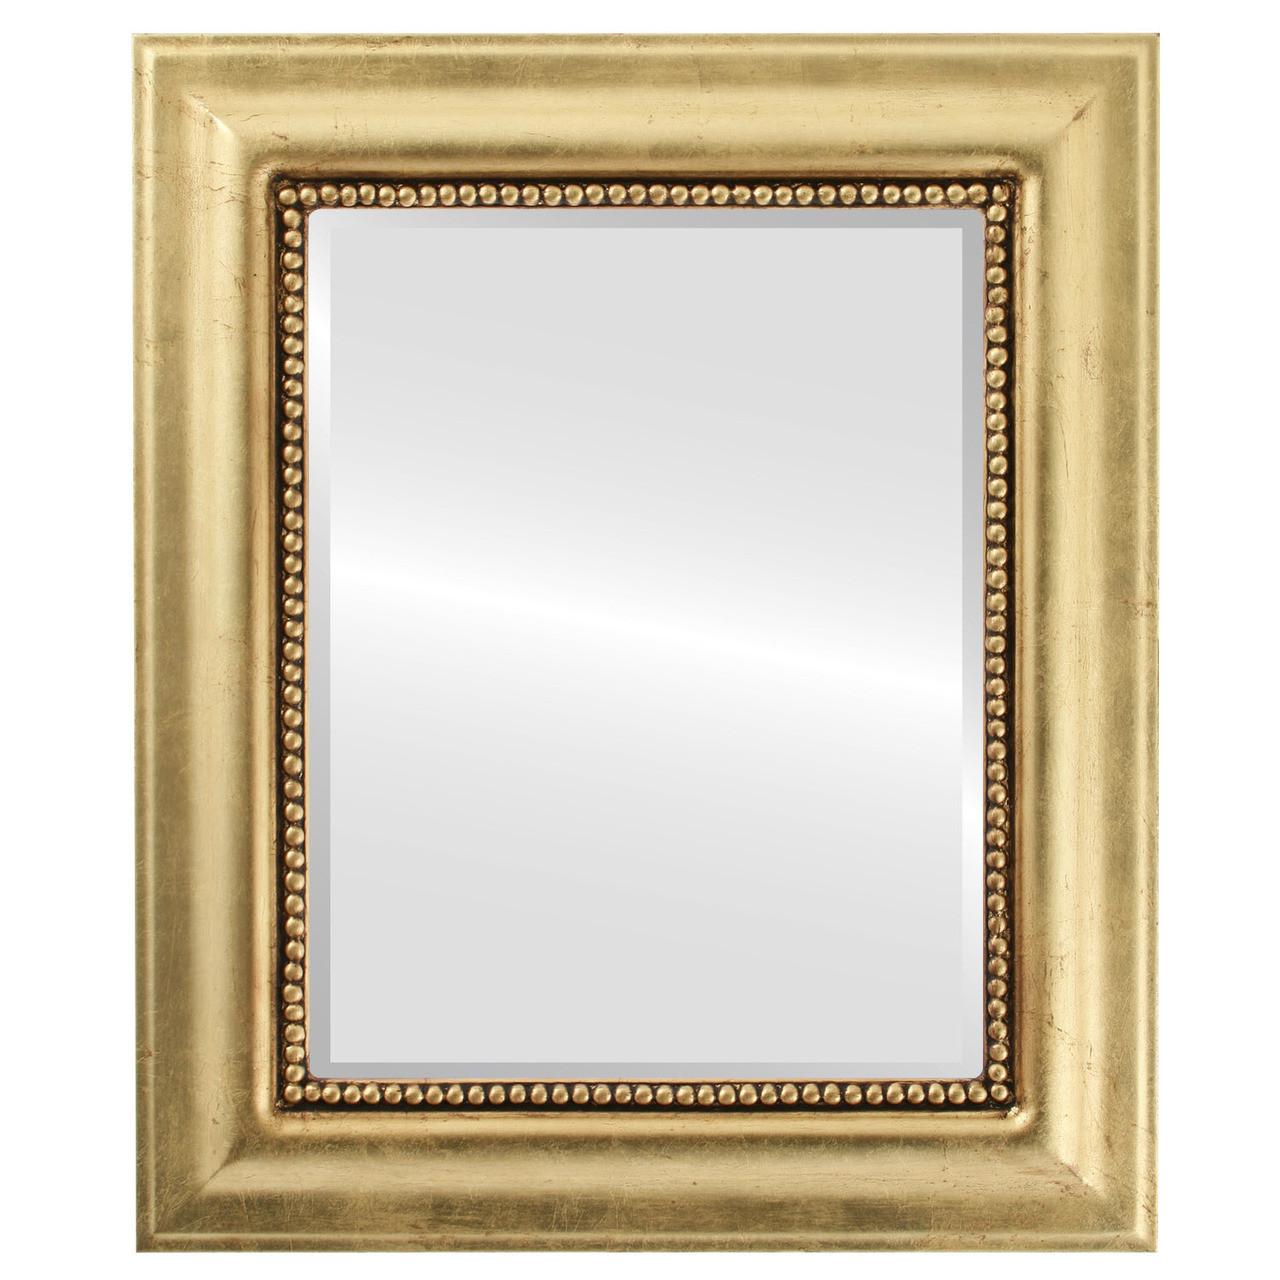 6795f7e8bee7 Beveled Mirror - Heritage Rectangle Frame - Gold Leaf